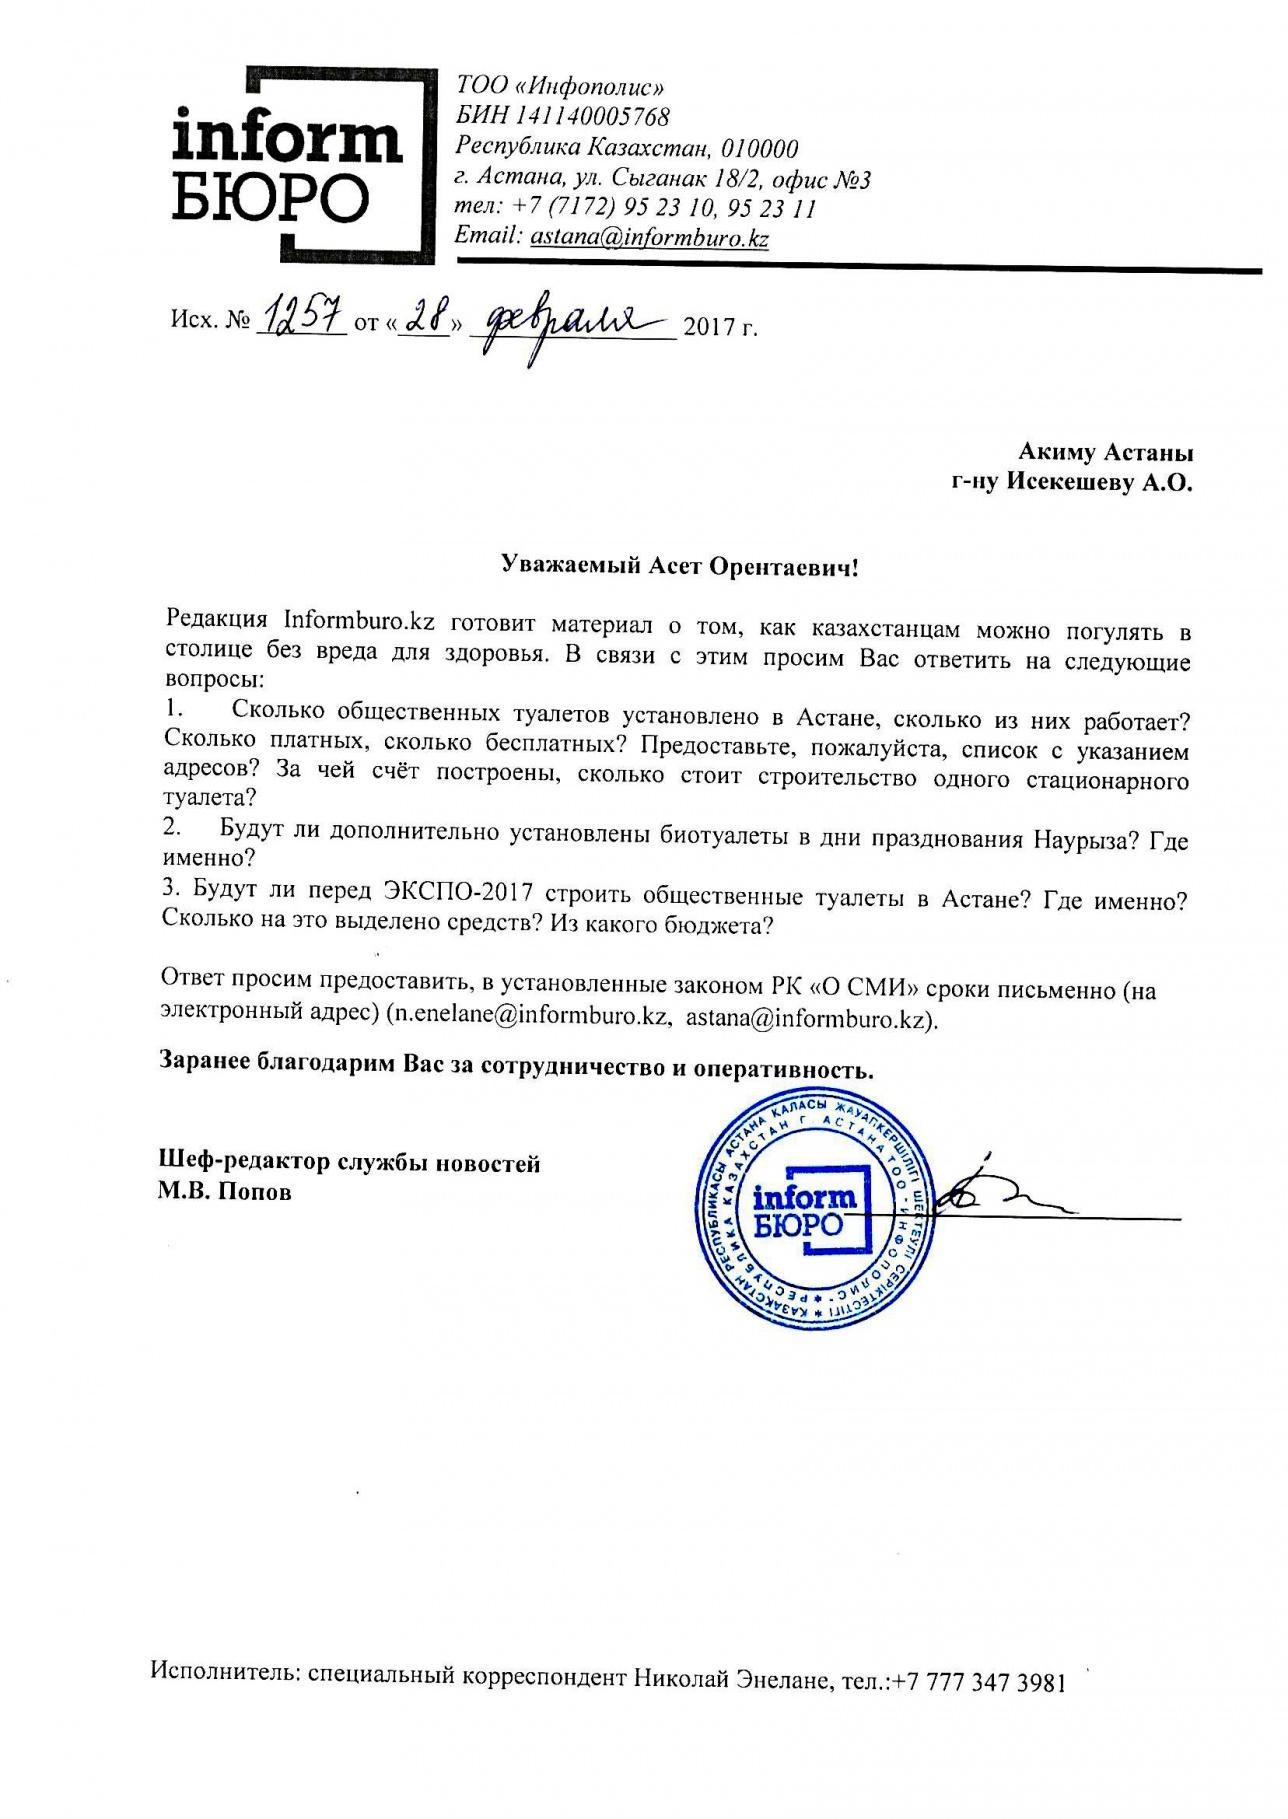 Запрос редакции informburo.kz